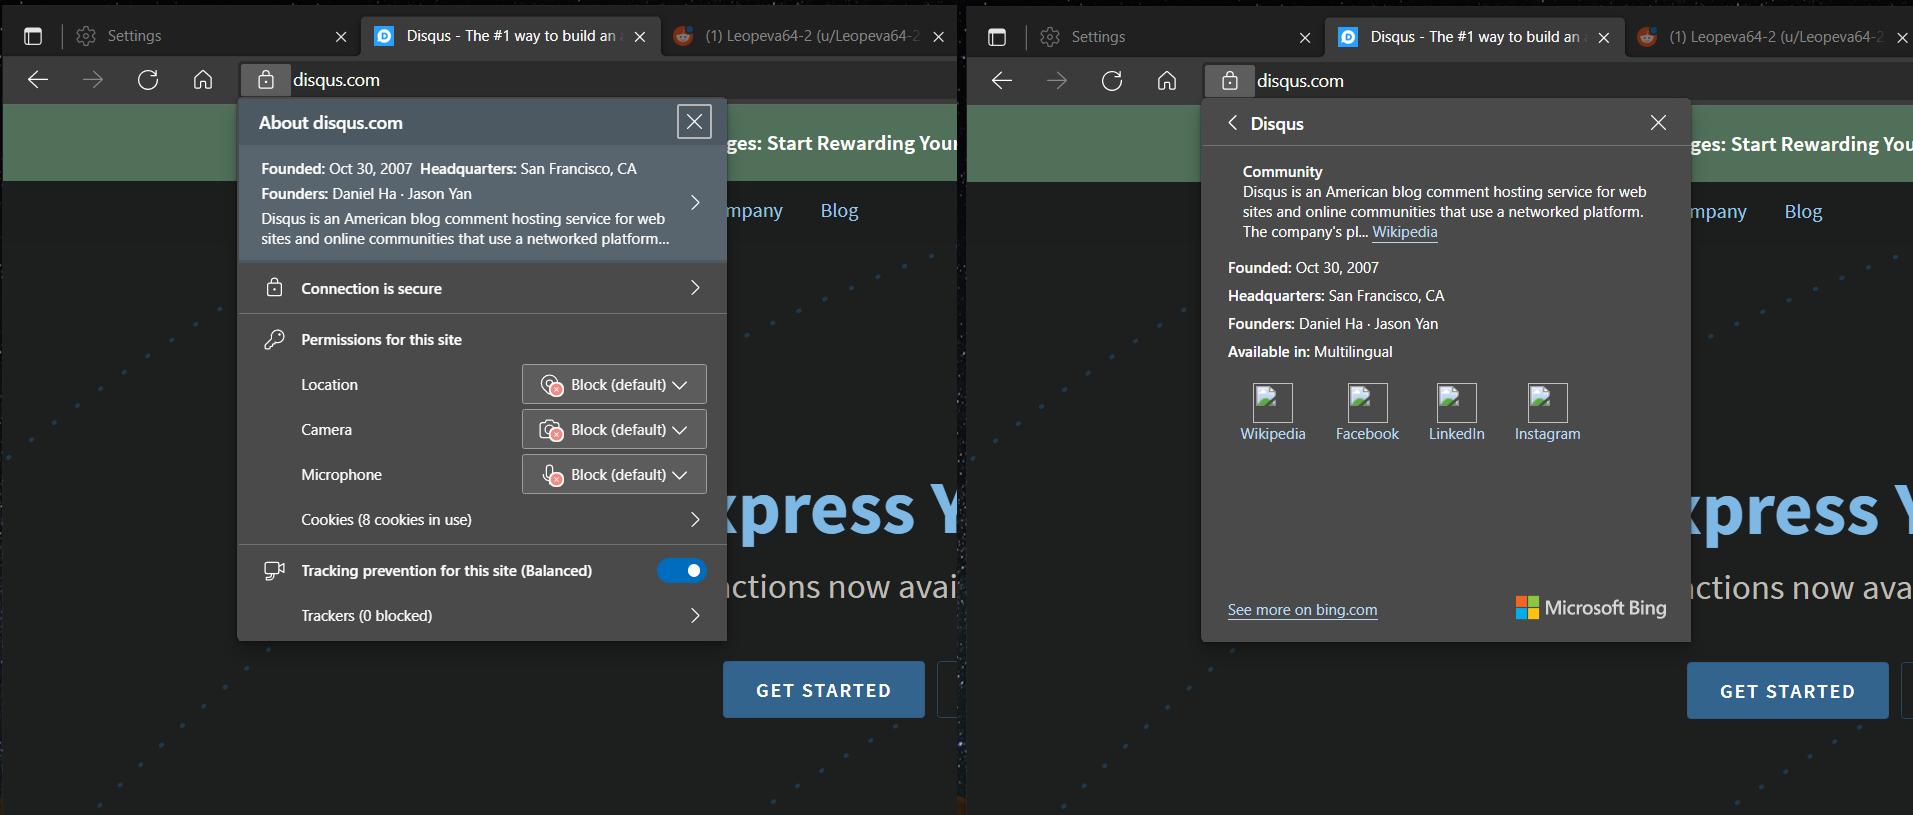 Edge浏览器可展示当前站点的维基百科简介信息